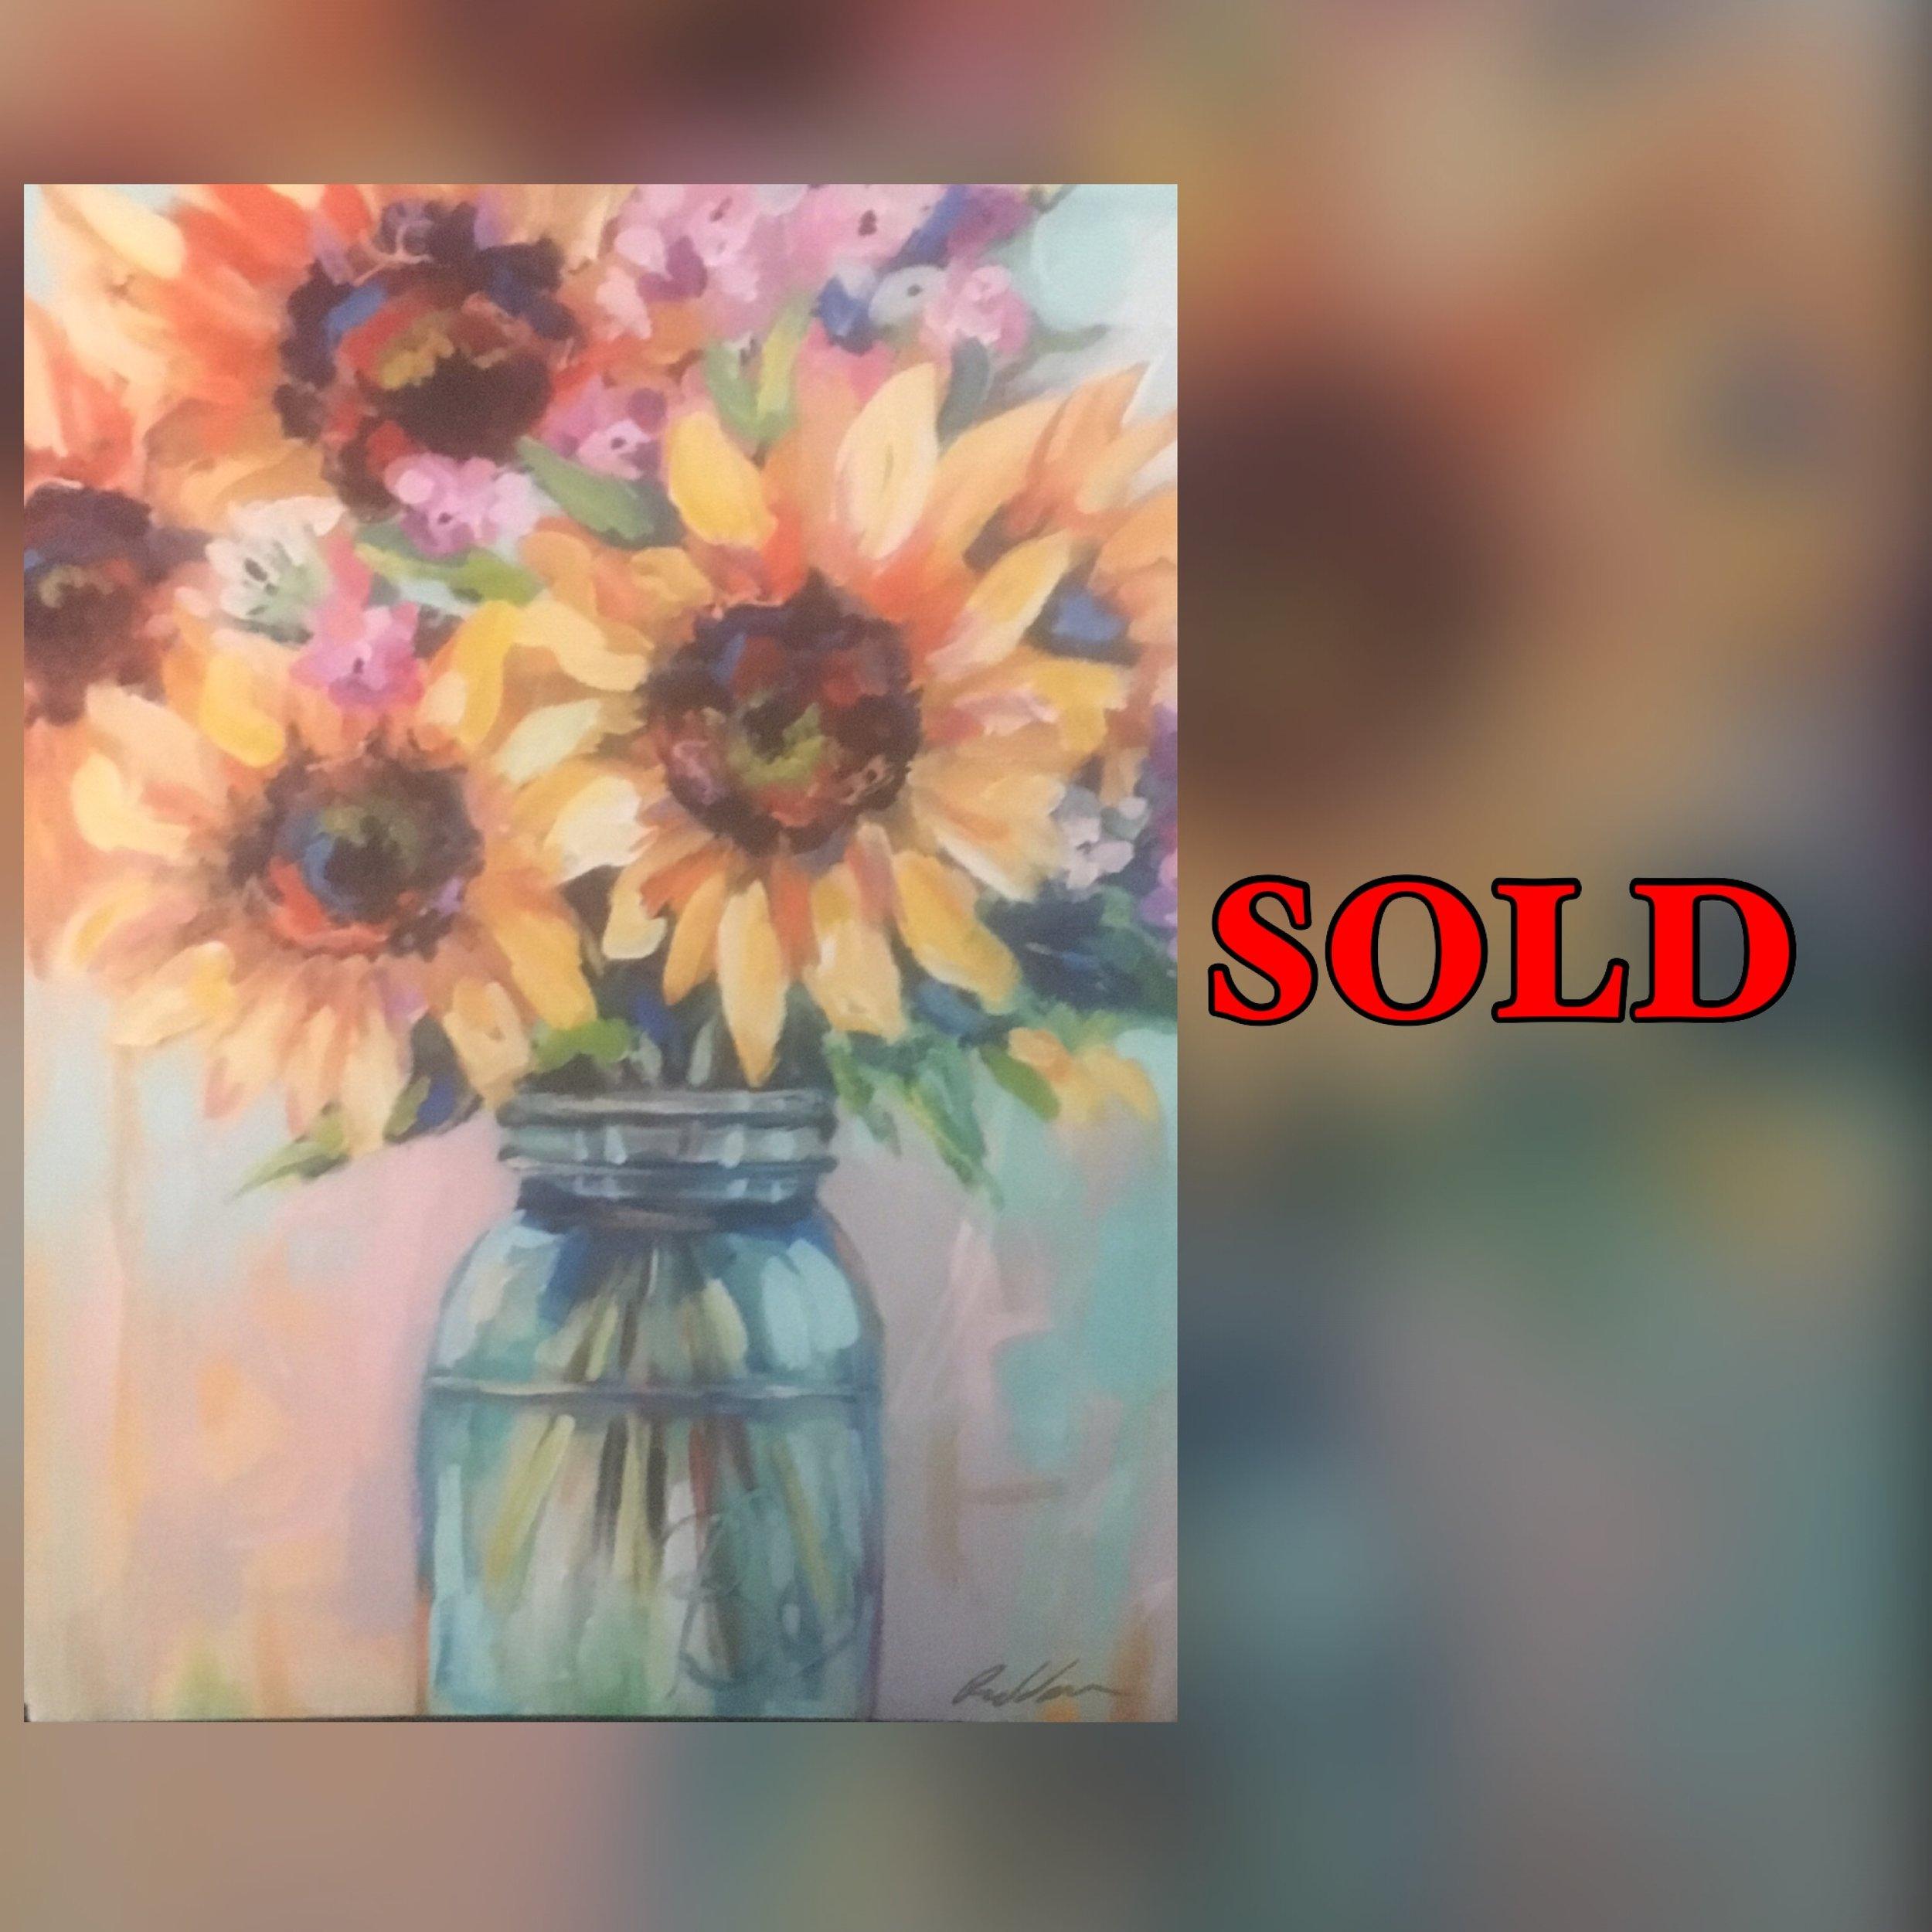 Sunflower Dawn Moraga Sold.jpg